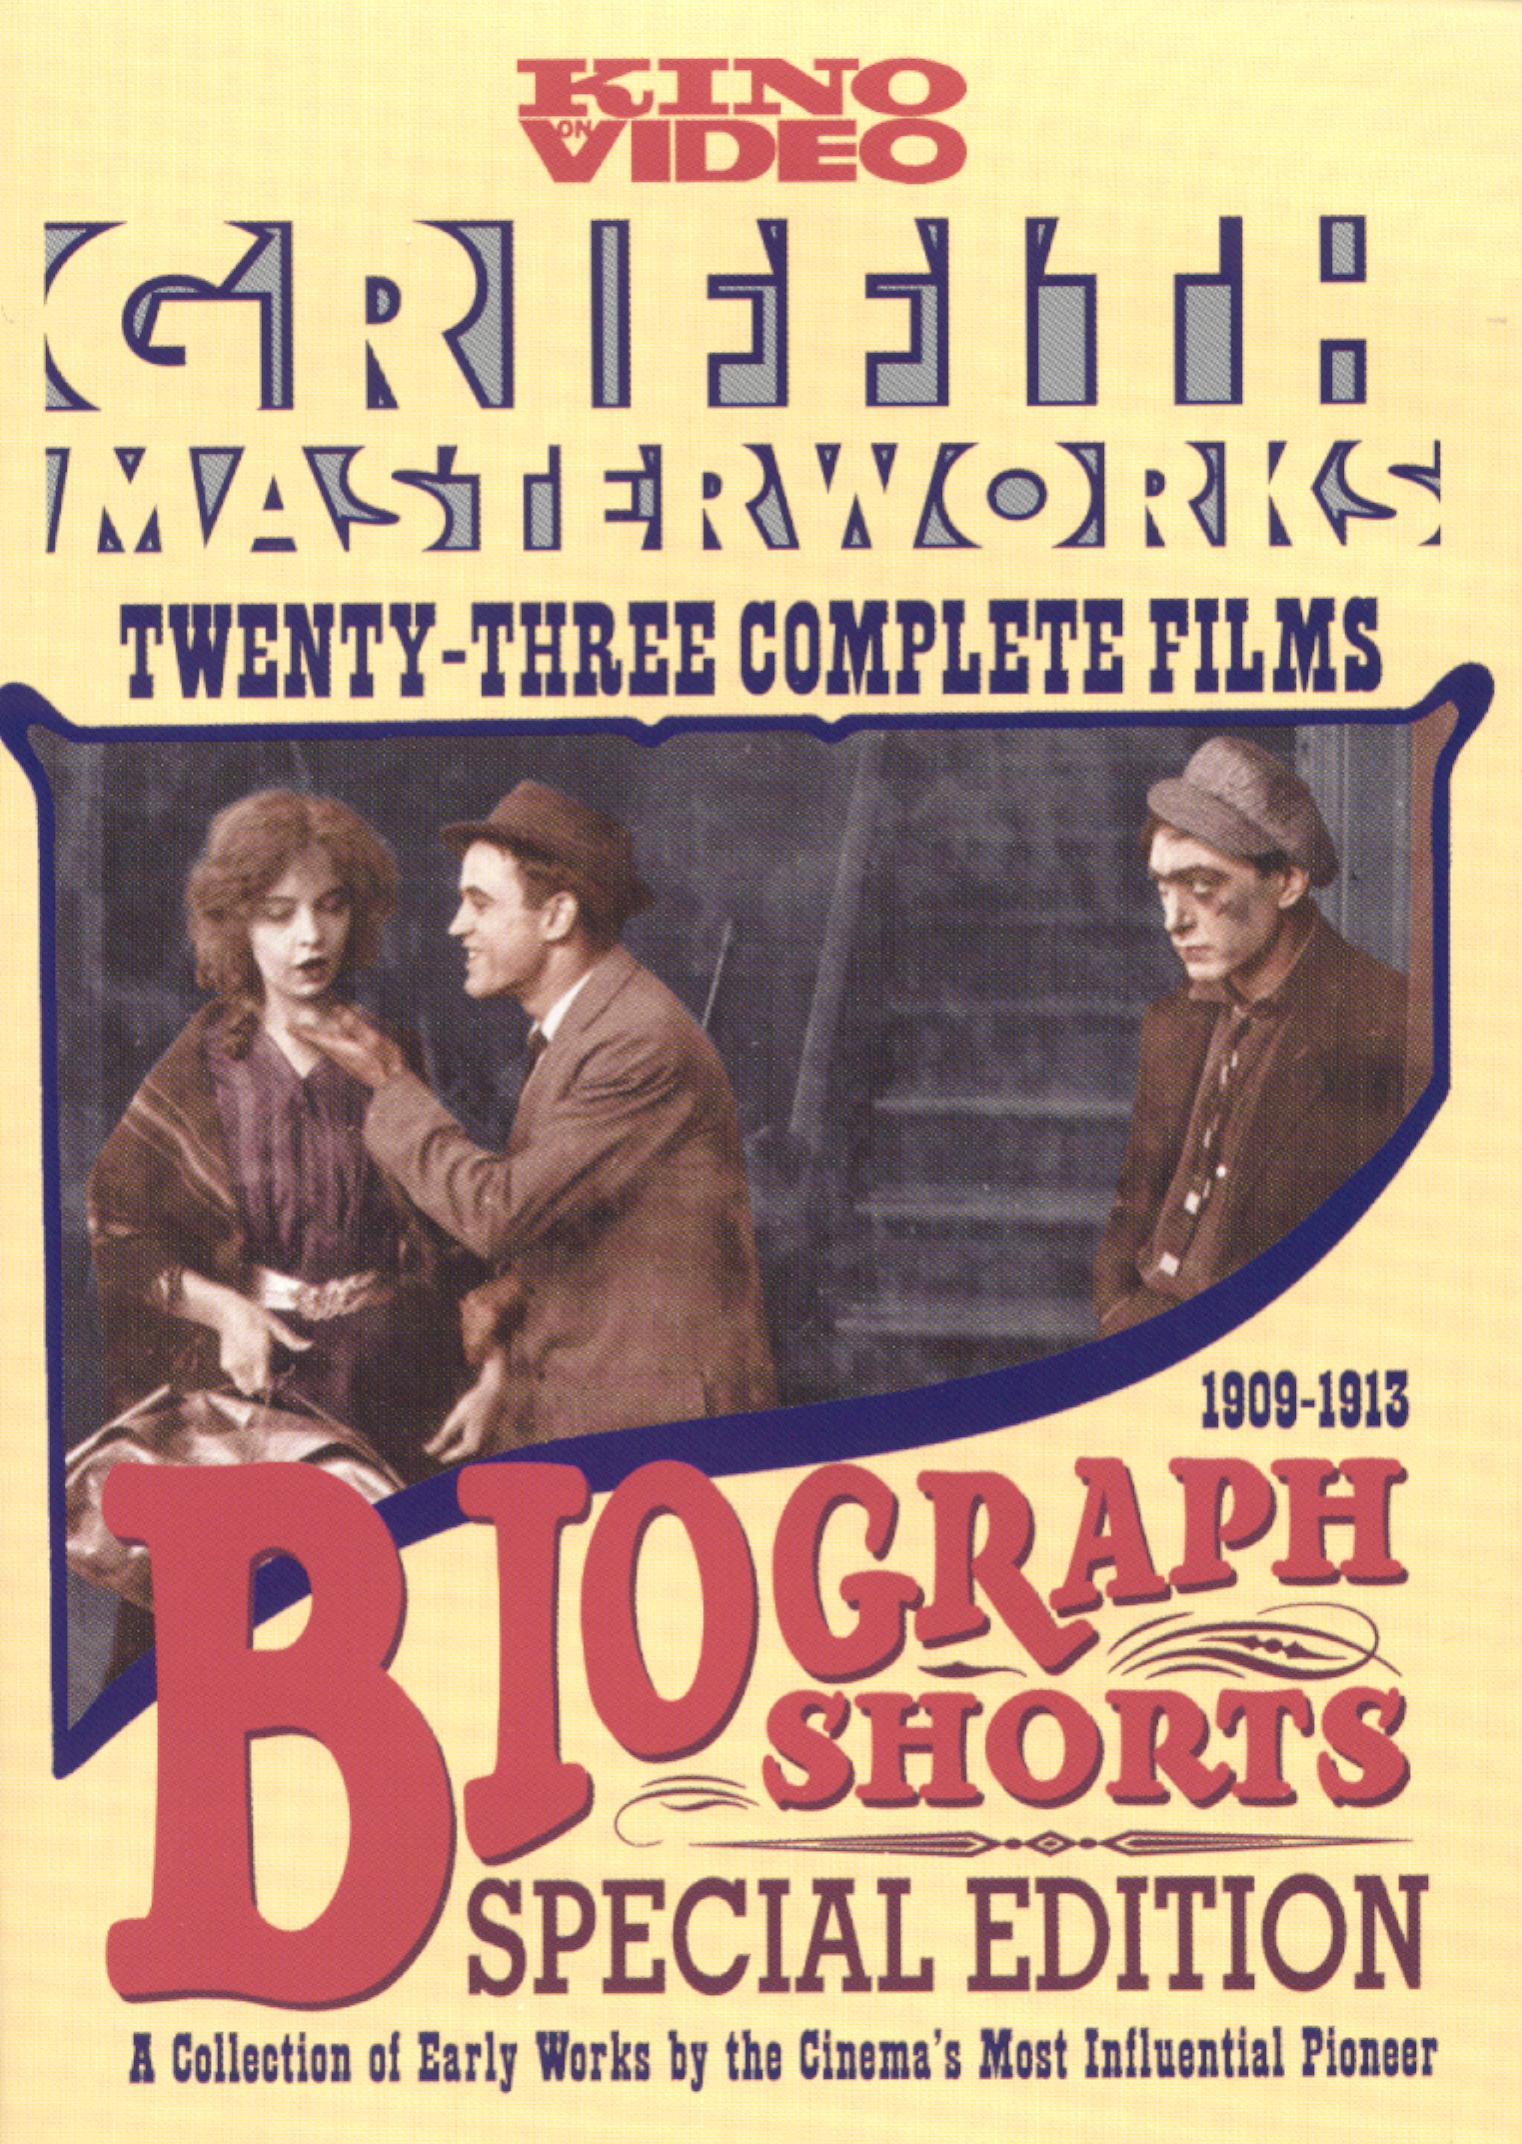 Biograph Shorts: Griffith Masterworks [2 Discs] (dvd) 5219836